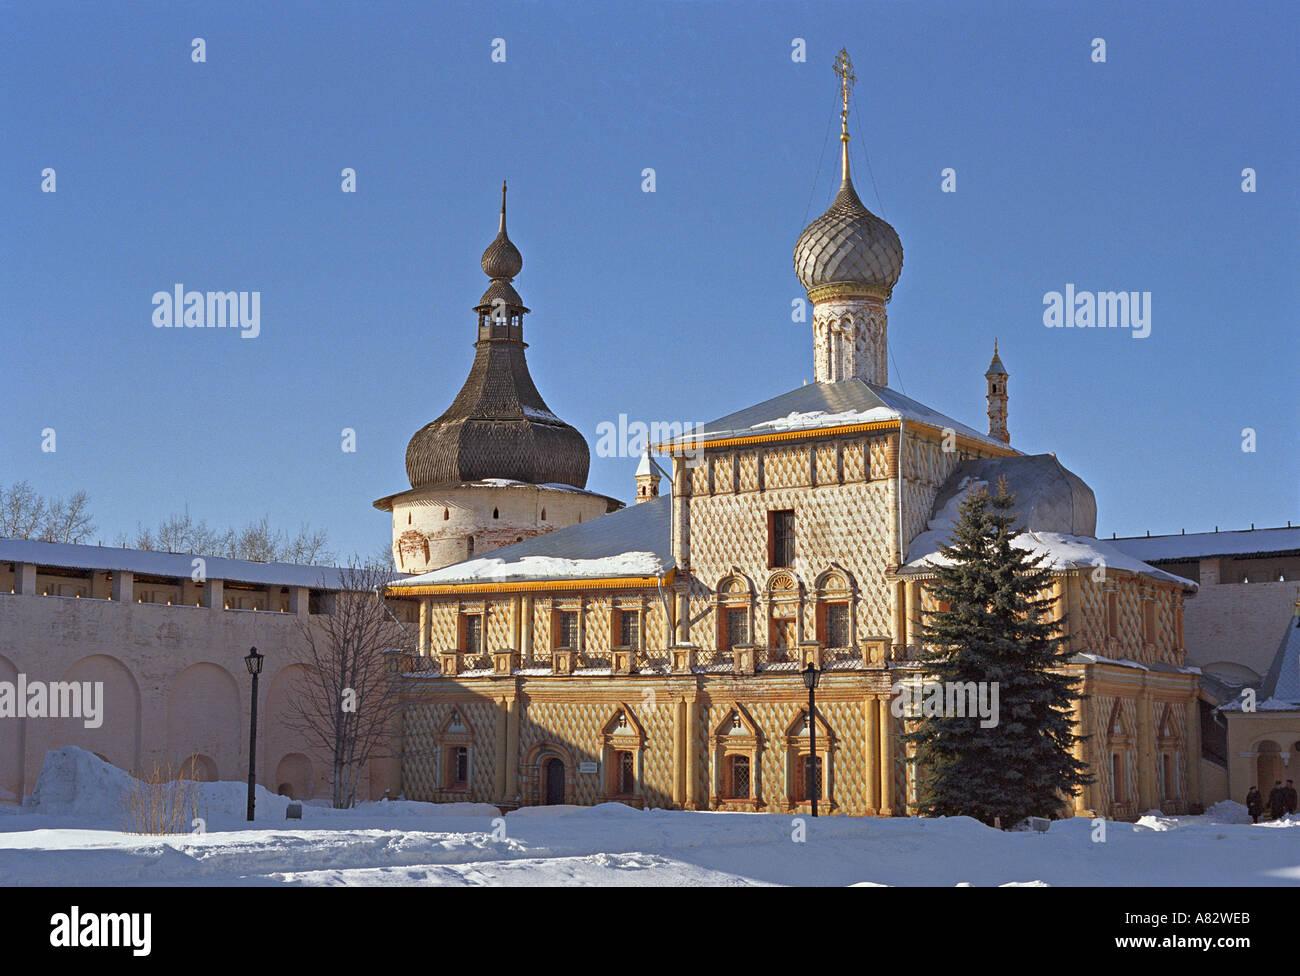 Rostov Kremlin: description, history. State Museum-Reserve Rostov Kremlin 32